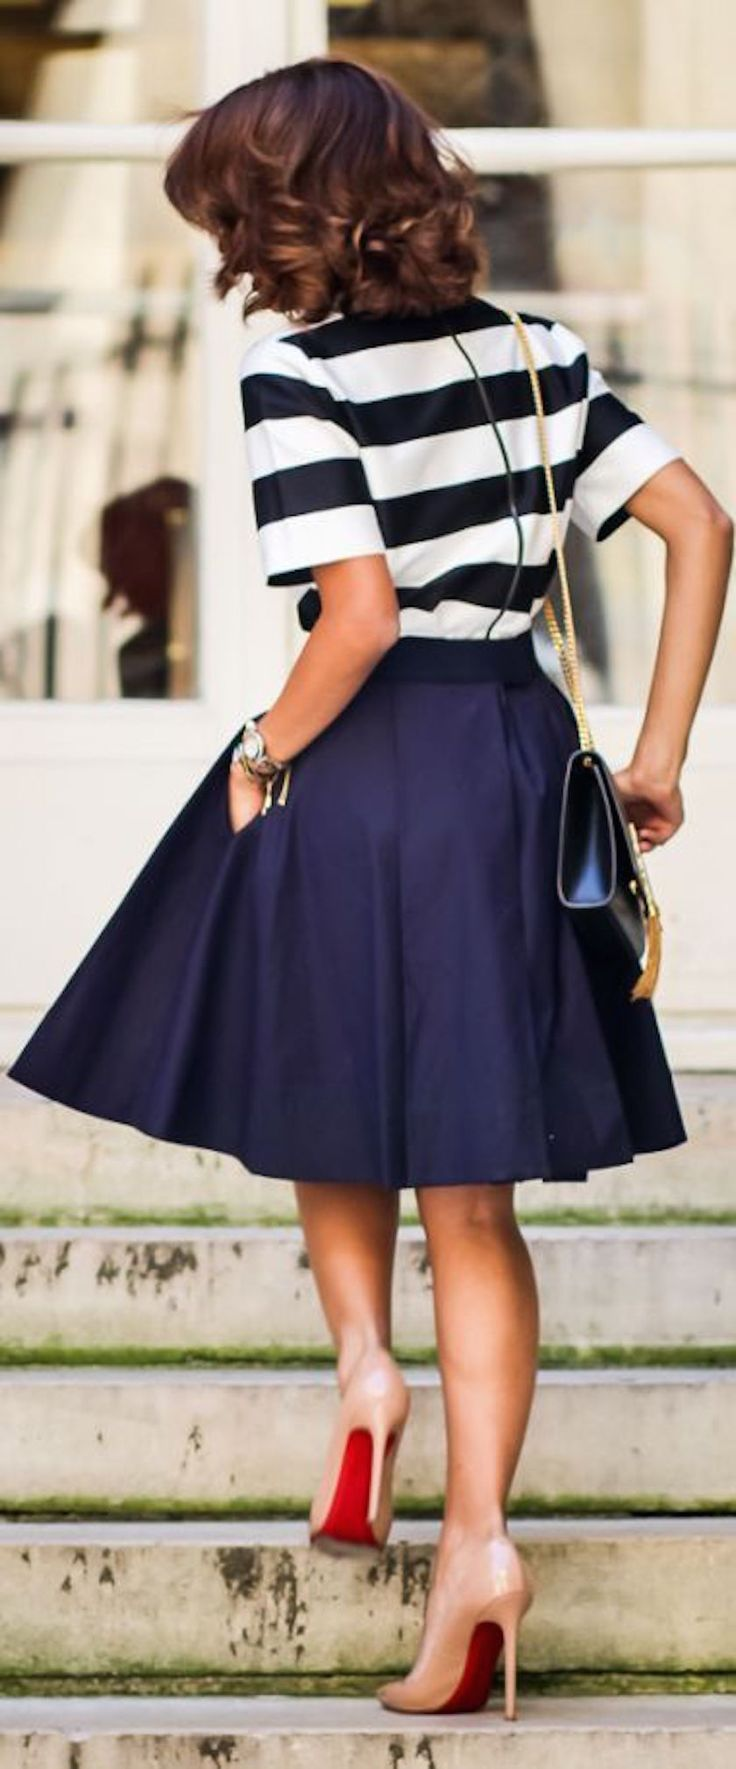 listras, listrado, navy,azul, look, para copiar, shorts, blusa,